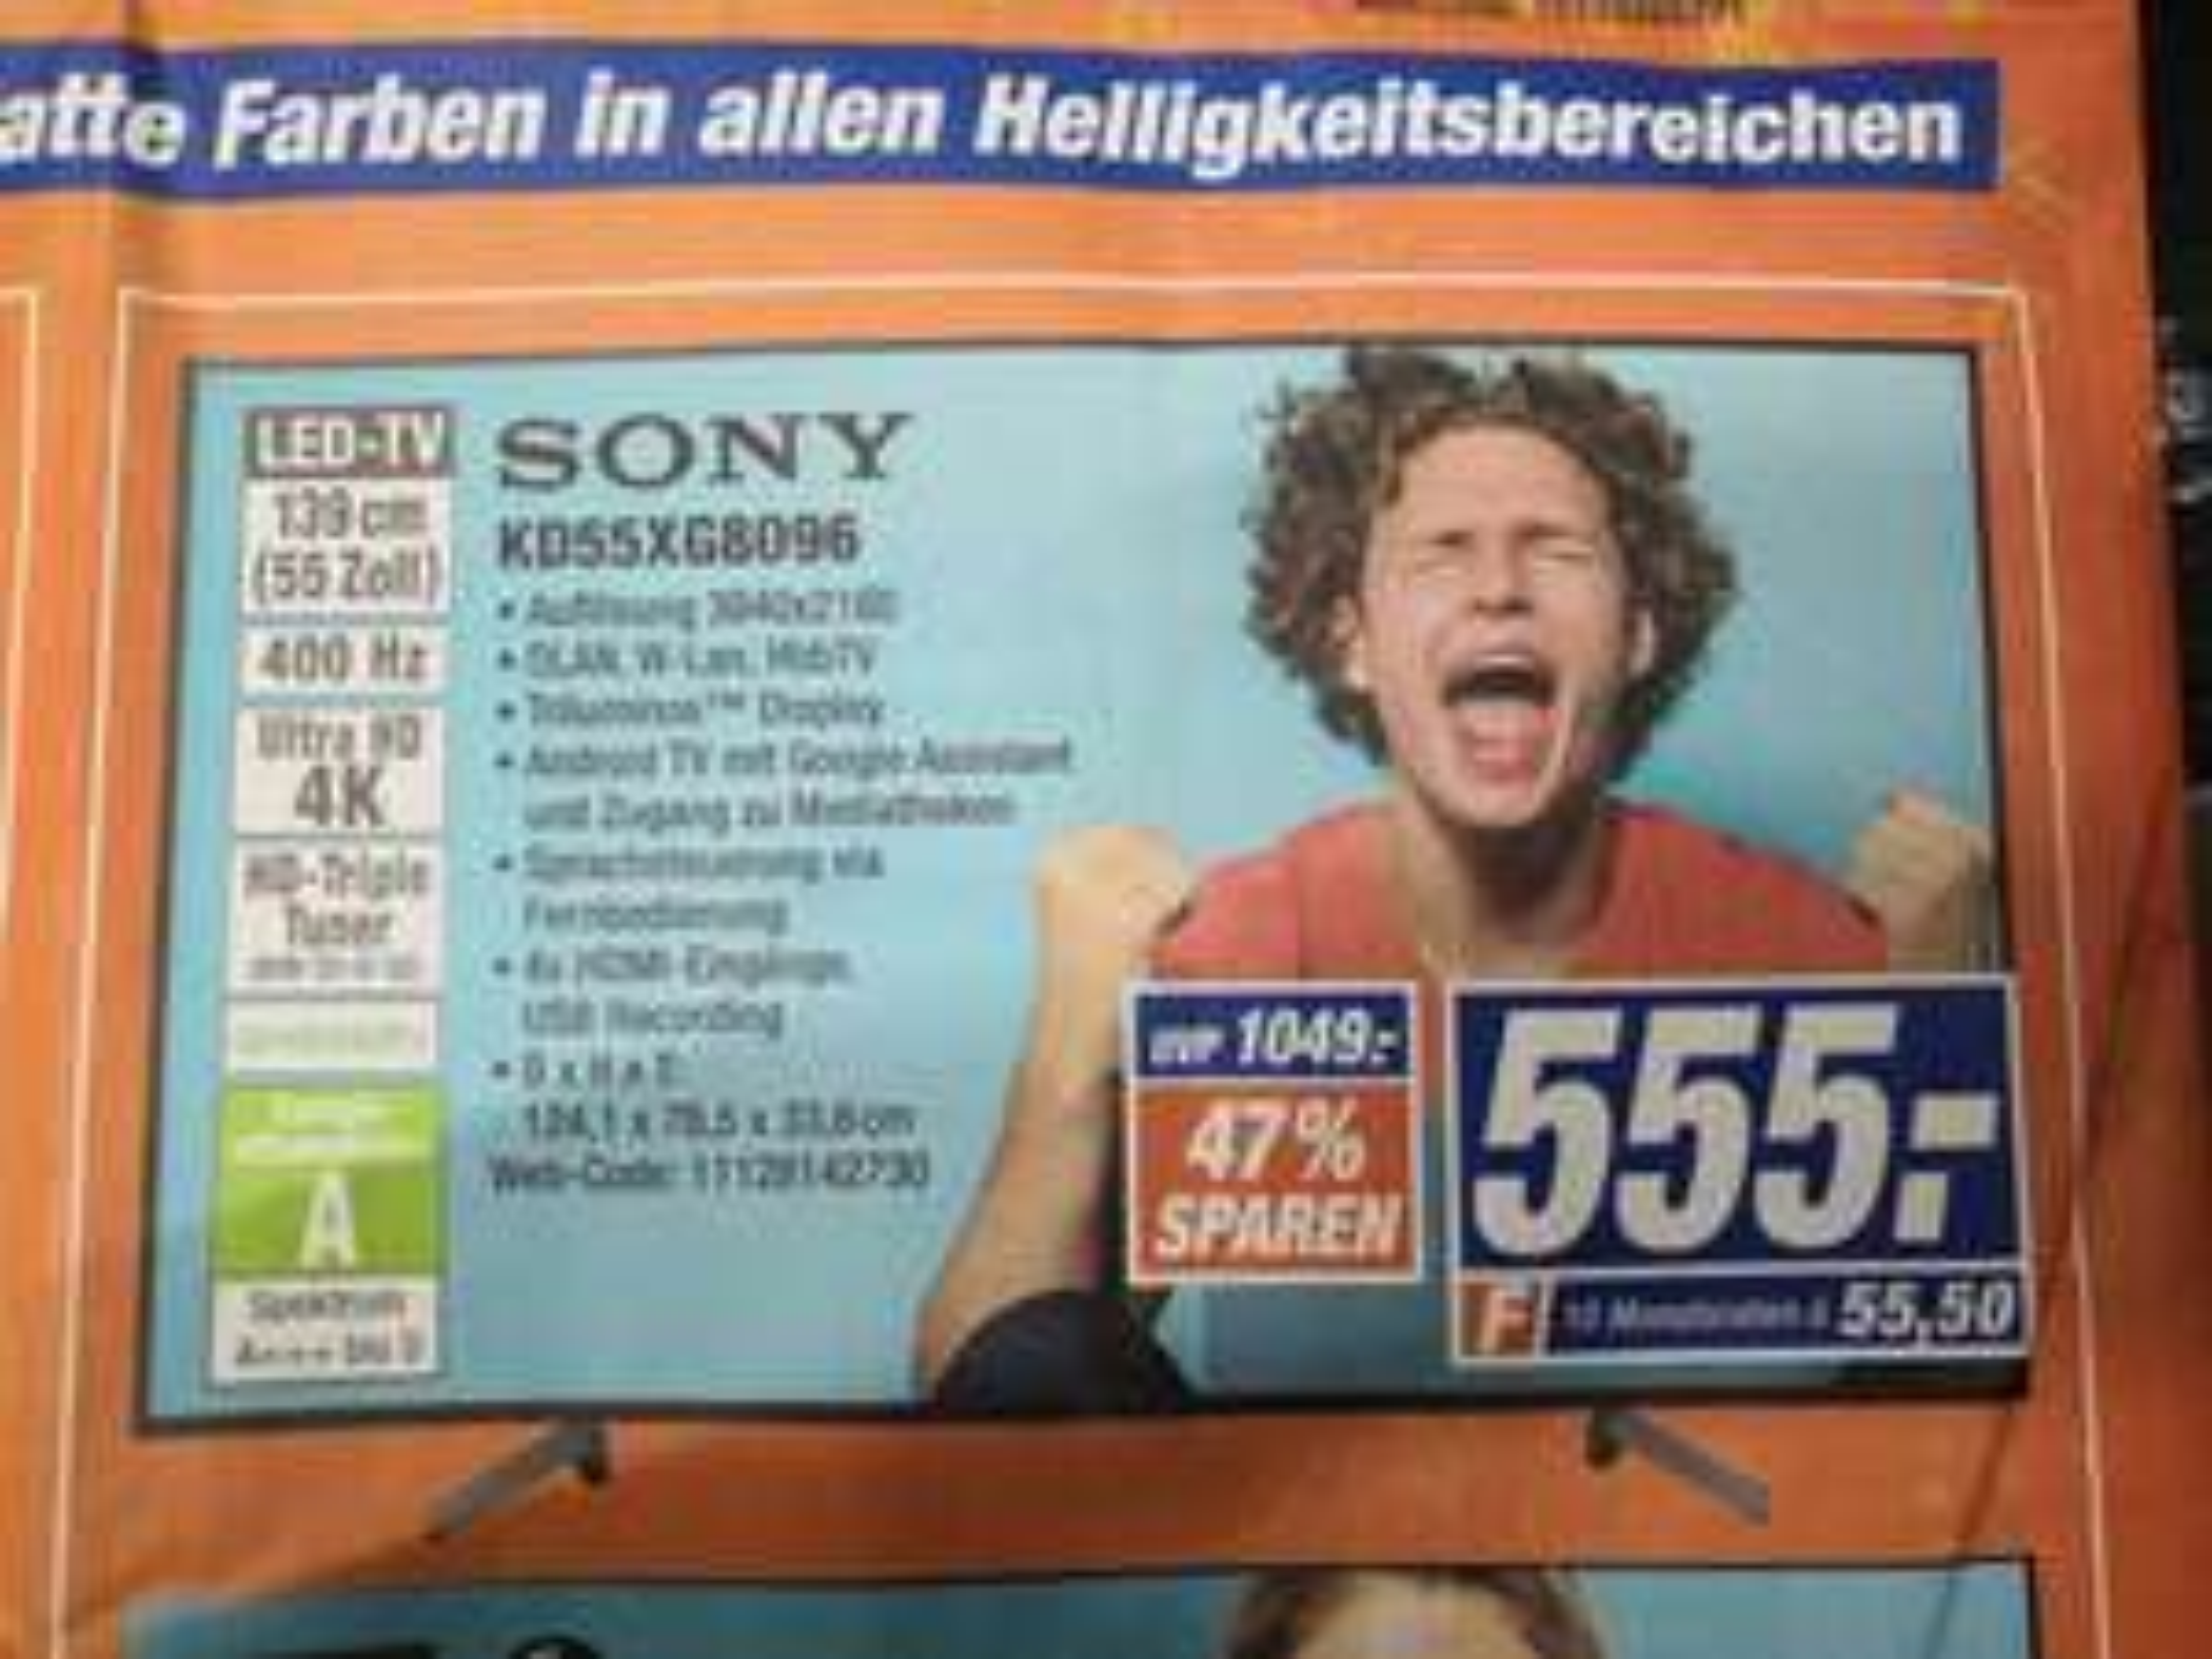 Sony KD55XG8096 4K Ultra HD TV (Smart TV, 4K, HDR, USB-Aufnahme, Google Assistent, Alexa)